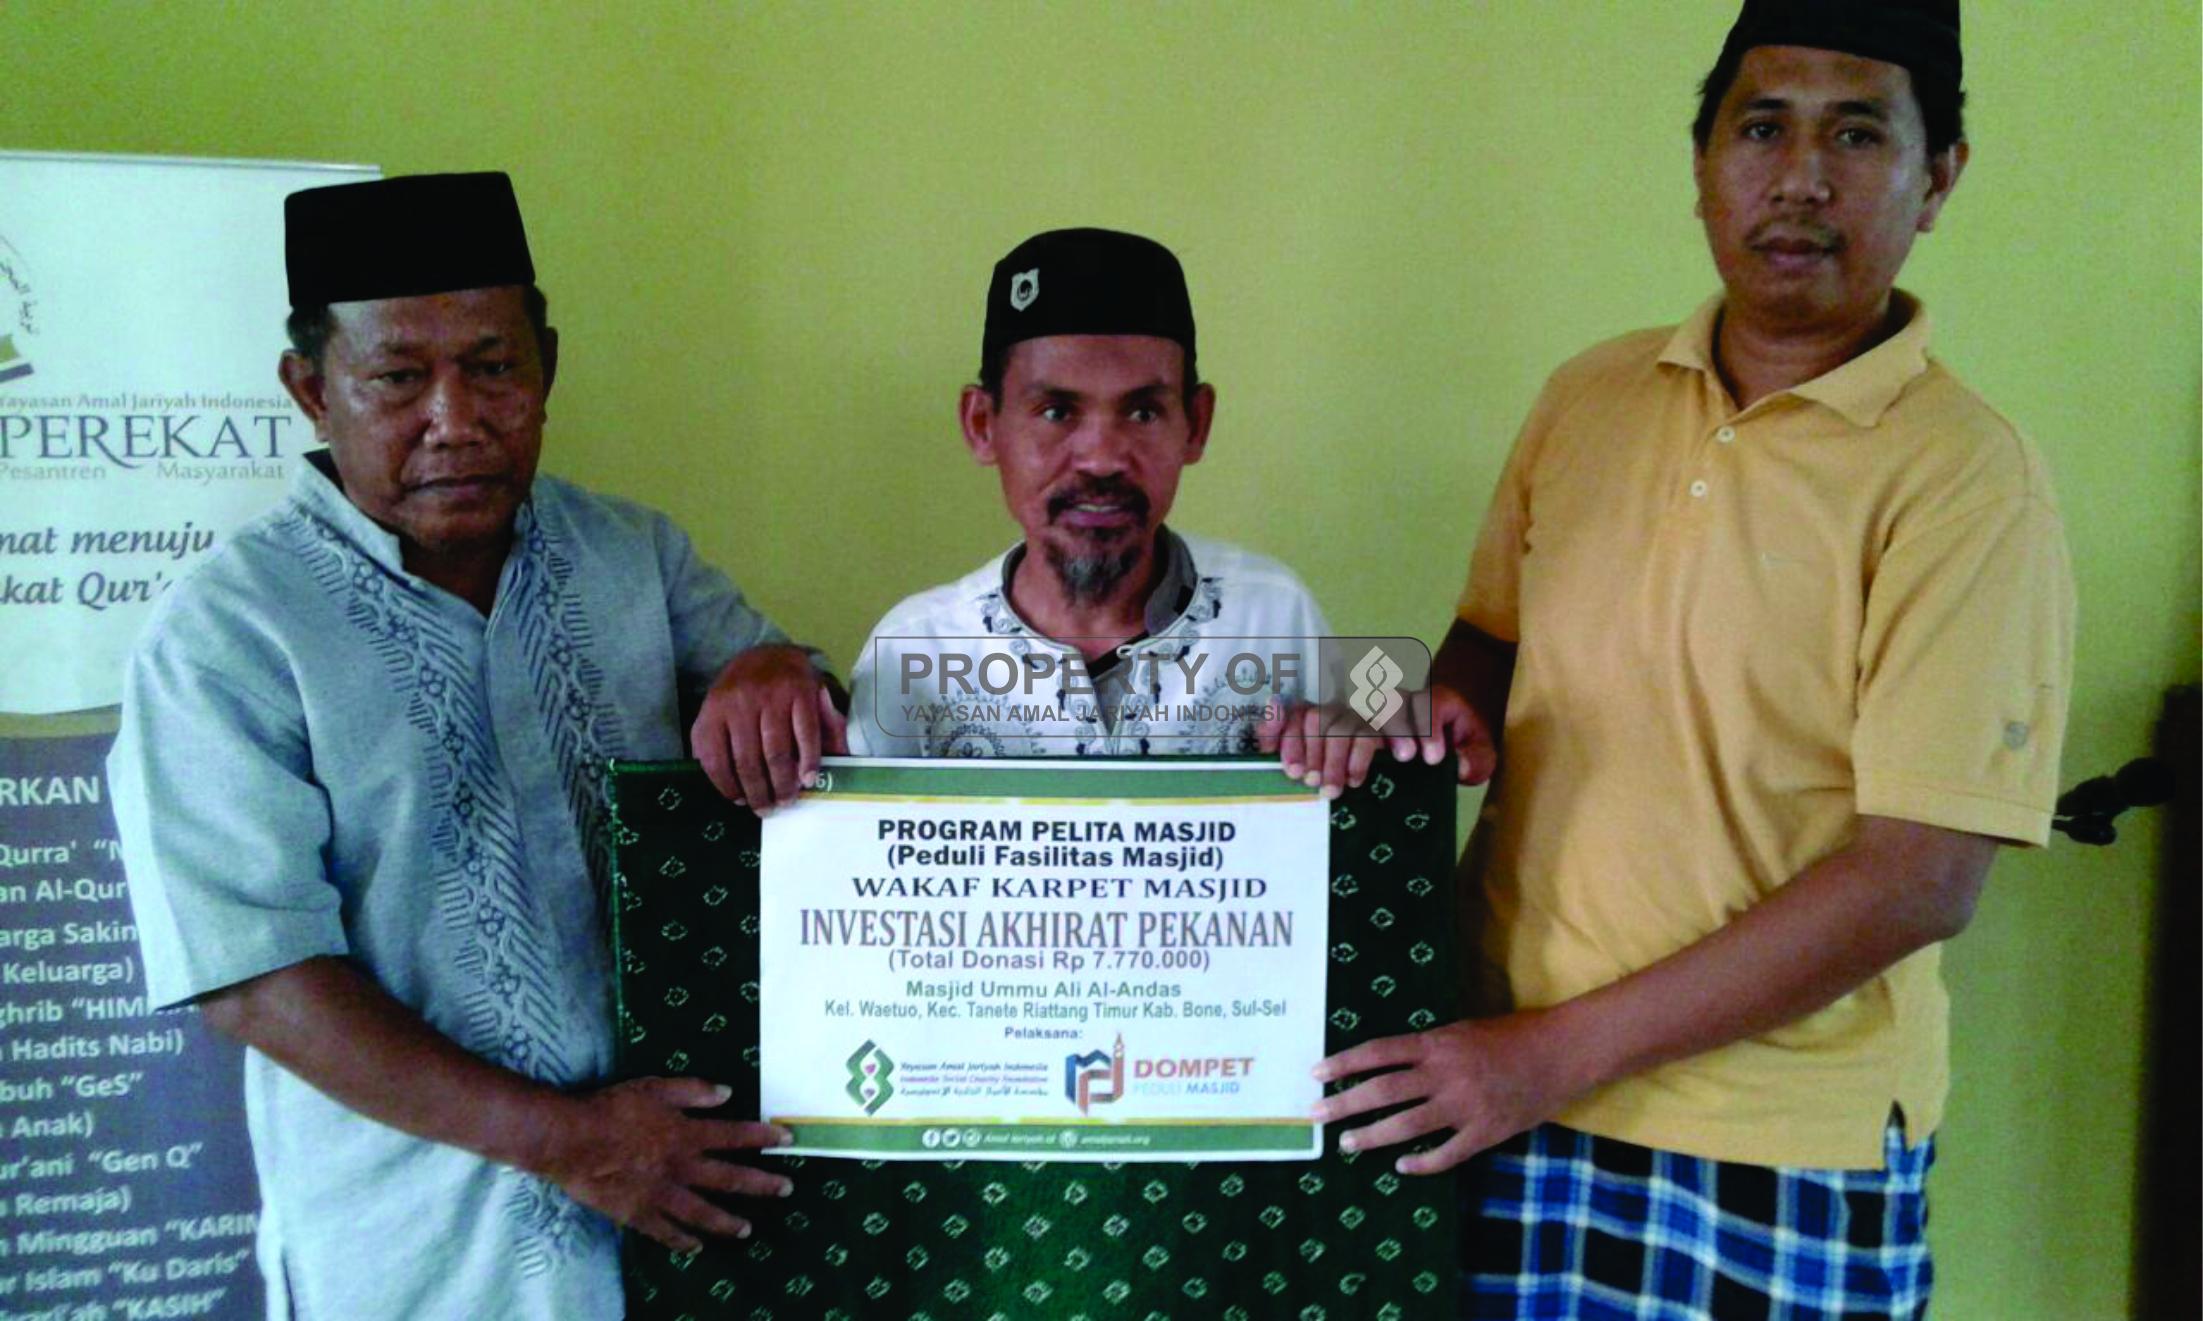 DPM YAJI; Penyaluran Wakaf Karpet untuk Masjid Ummu Ali